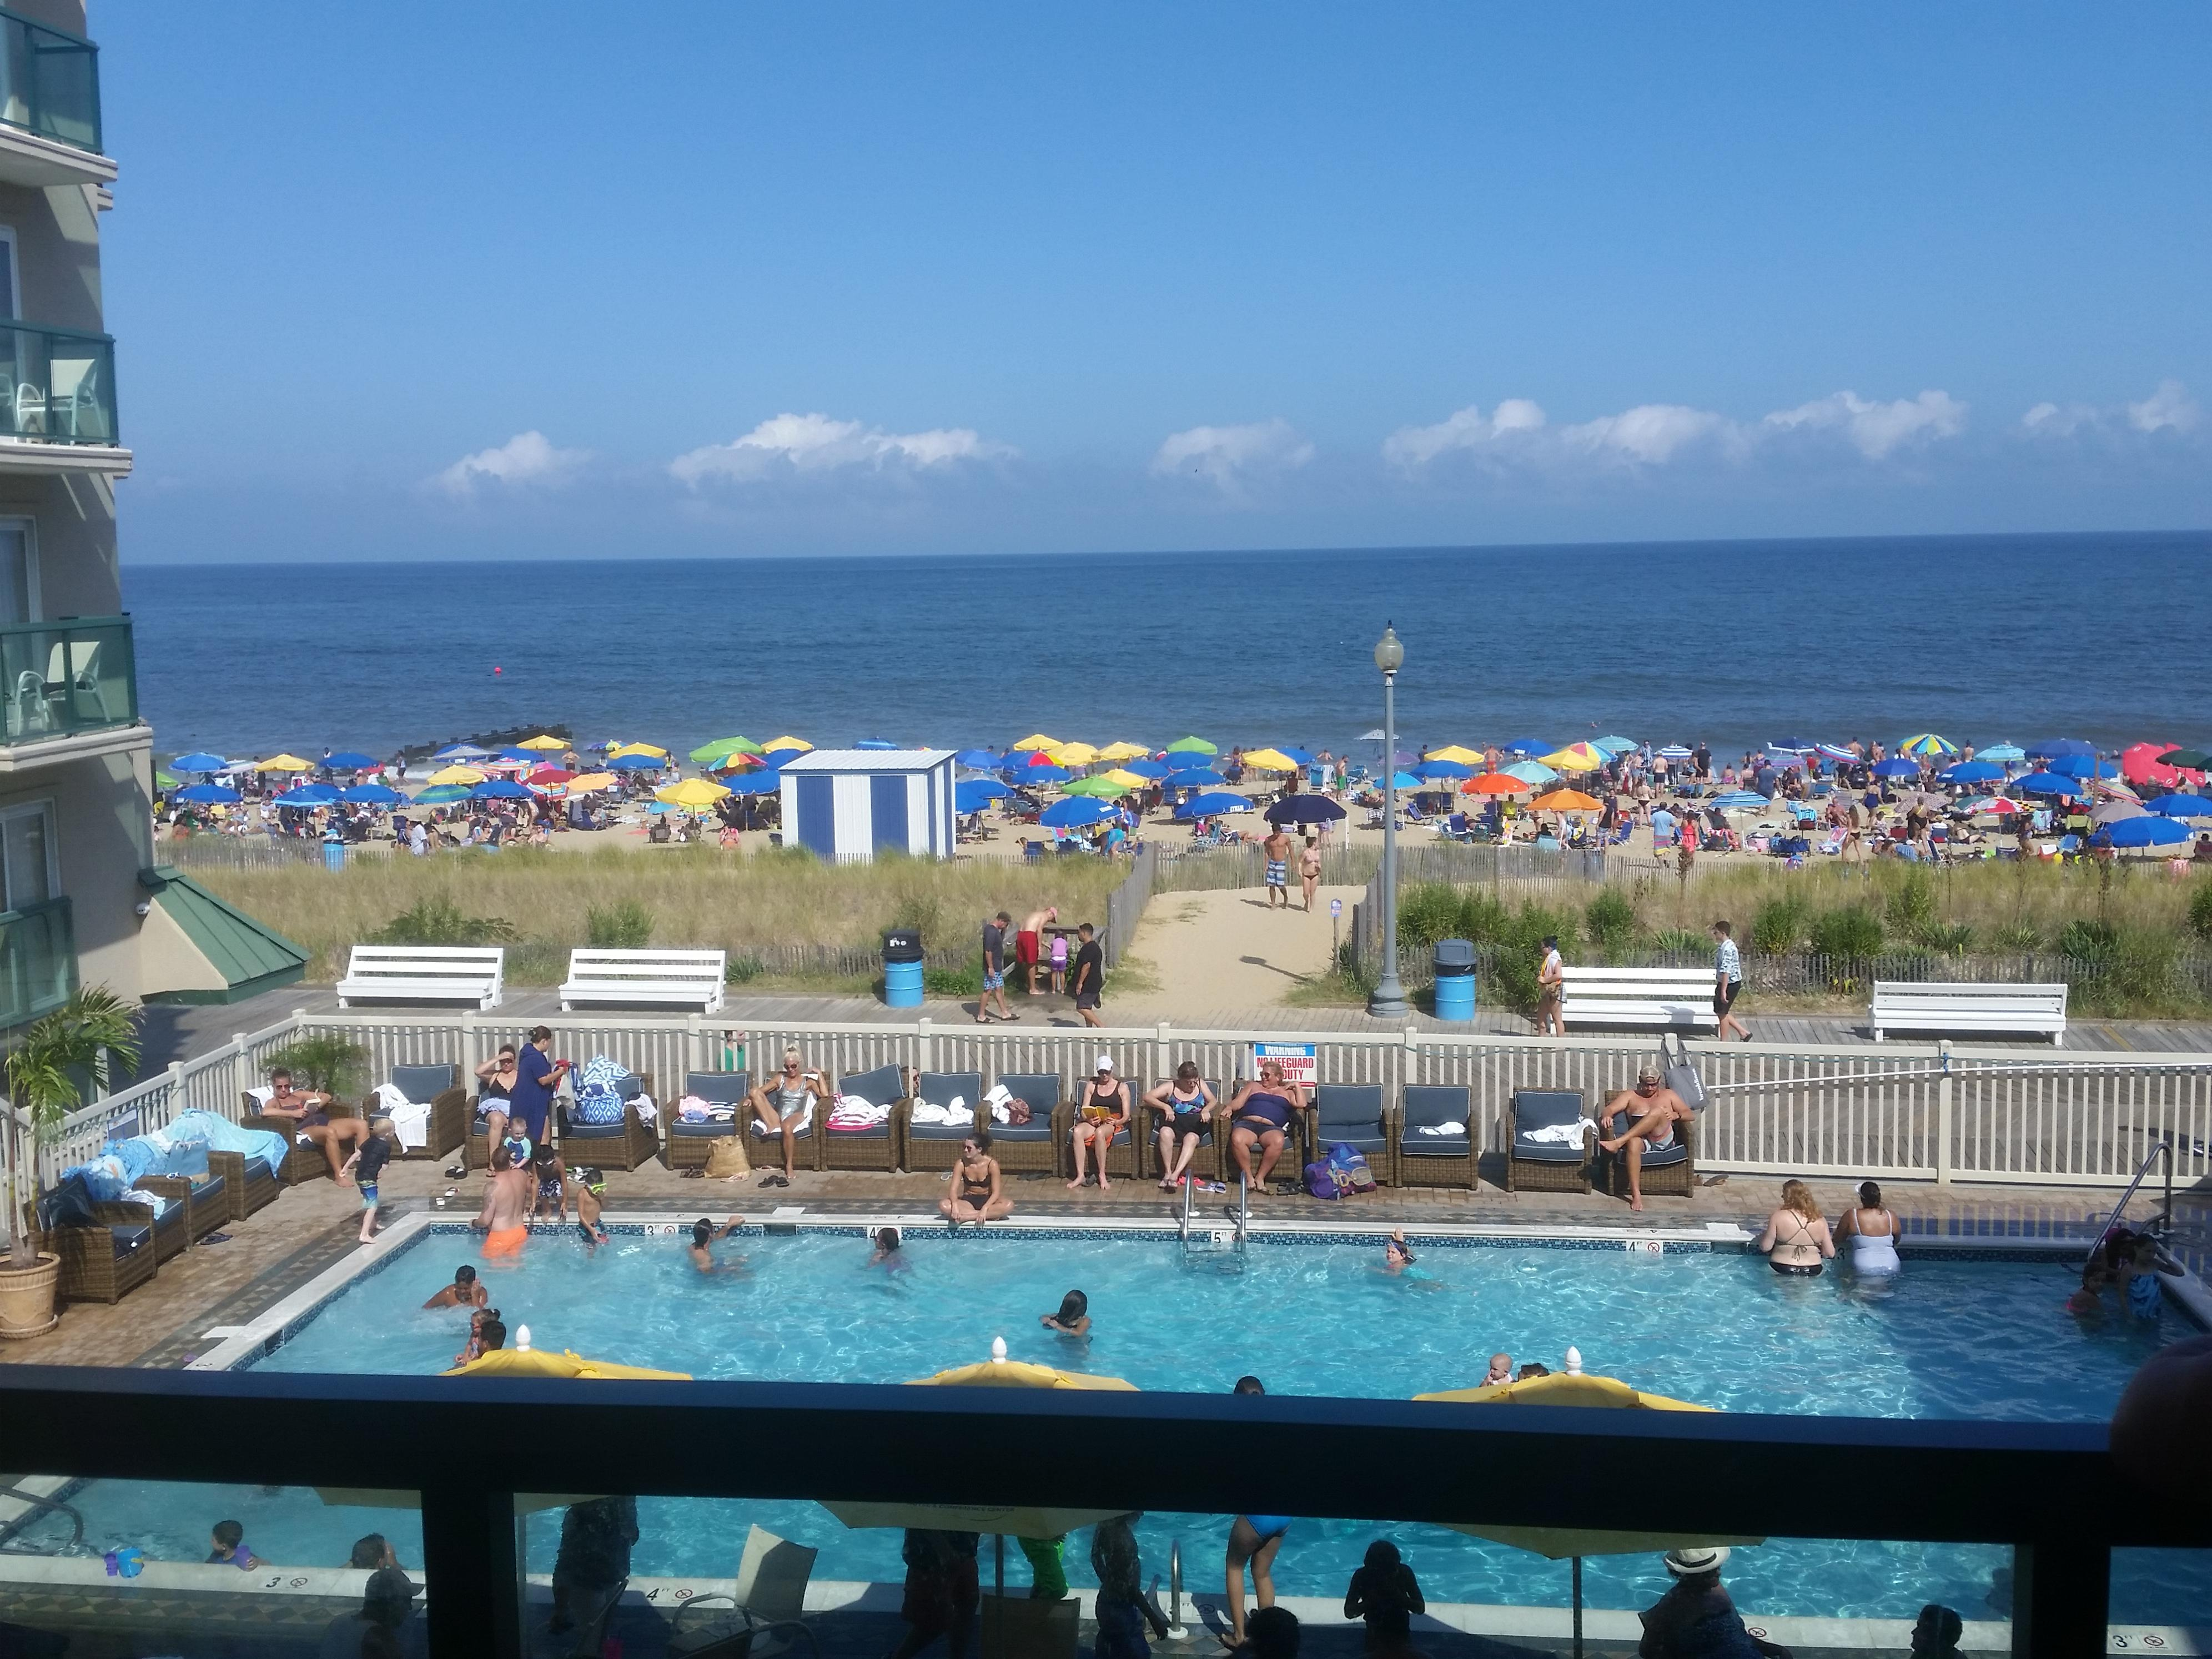 Atlantic Sands Hotel Conference Center 9 9 94 Fondos De Pantalla